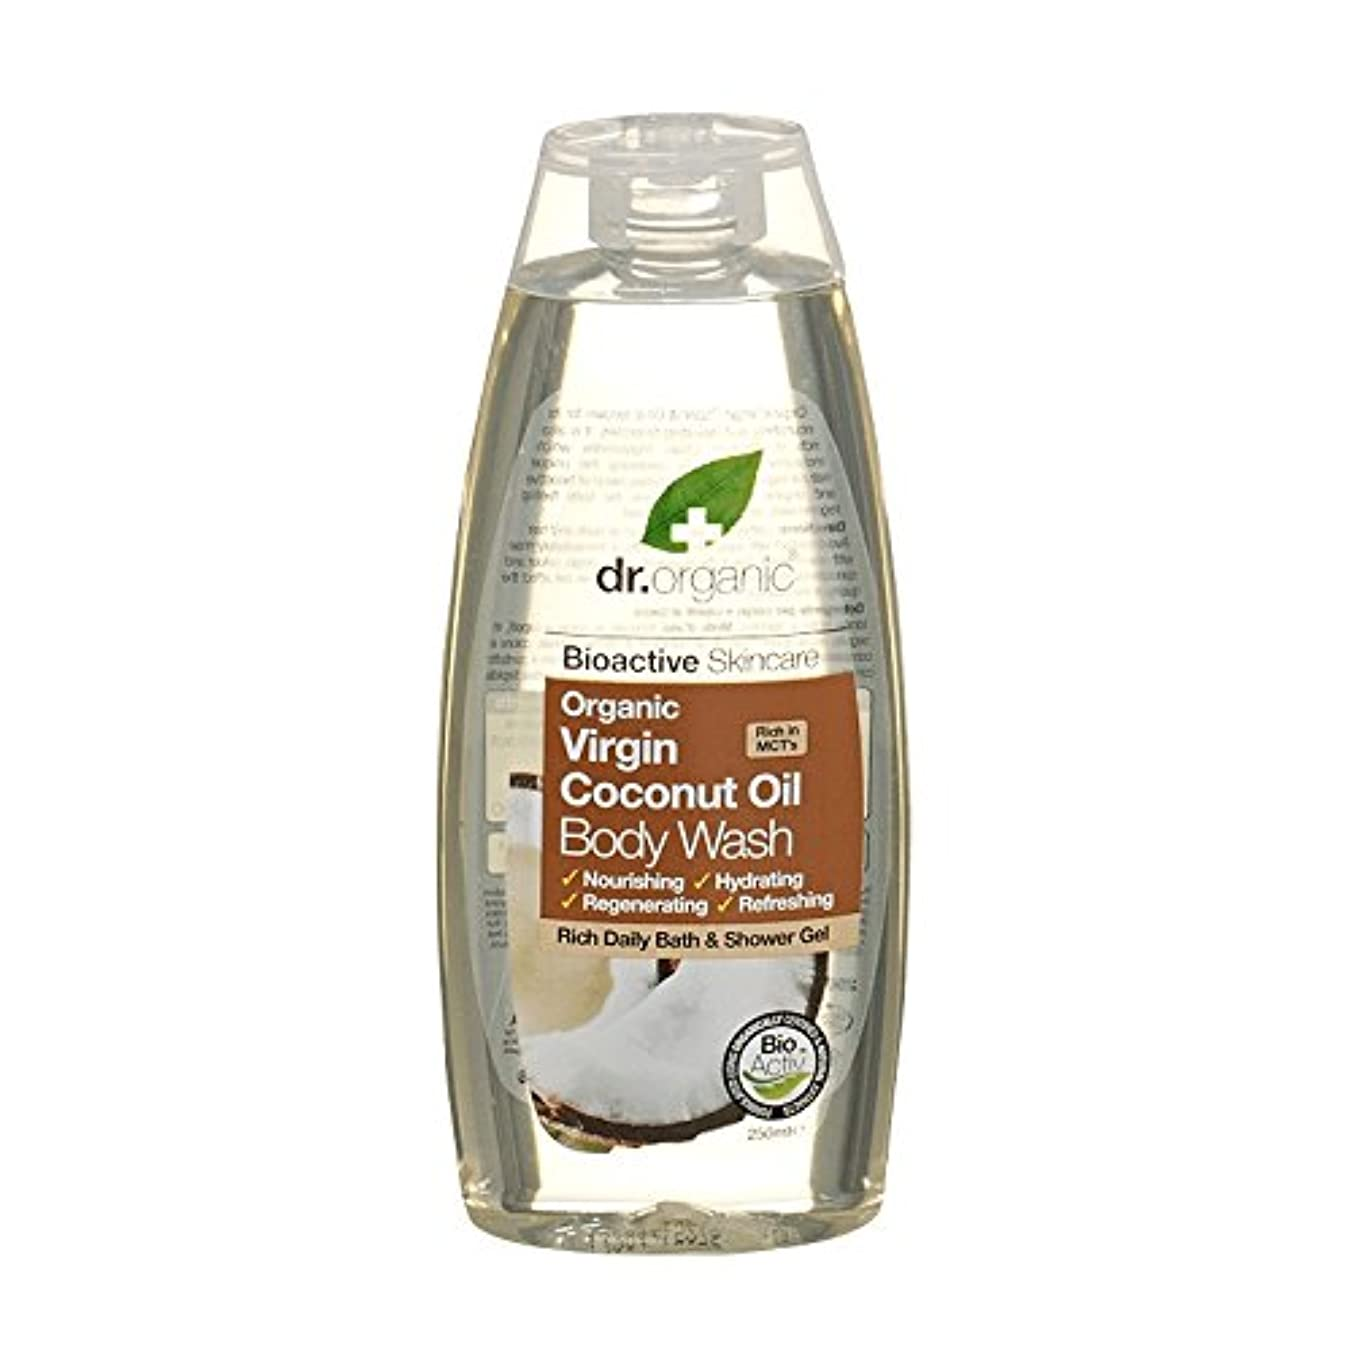 Dr Organic Organic Virgin Coconut Oil Body Wash (Pack of 2) - Dr有機有機バージンココナッツオイルボディウォッシュ (x2) [並行輸入品]